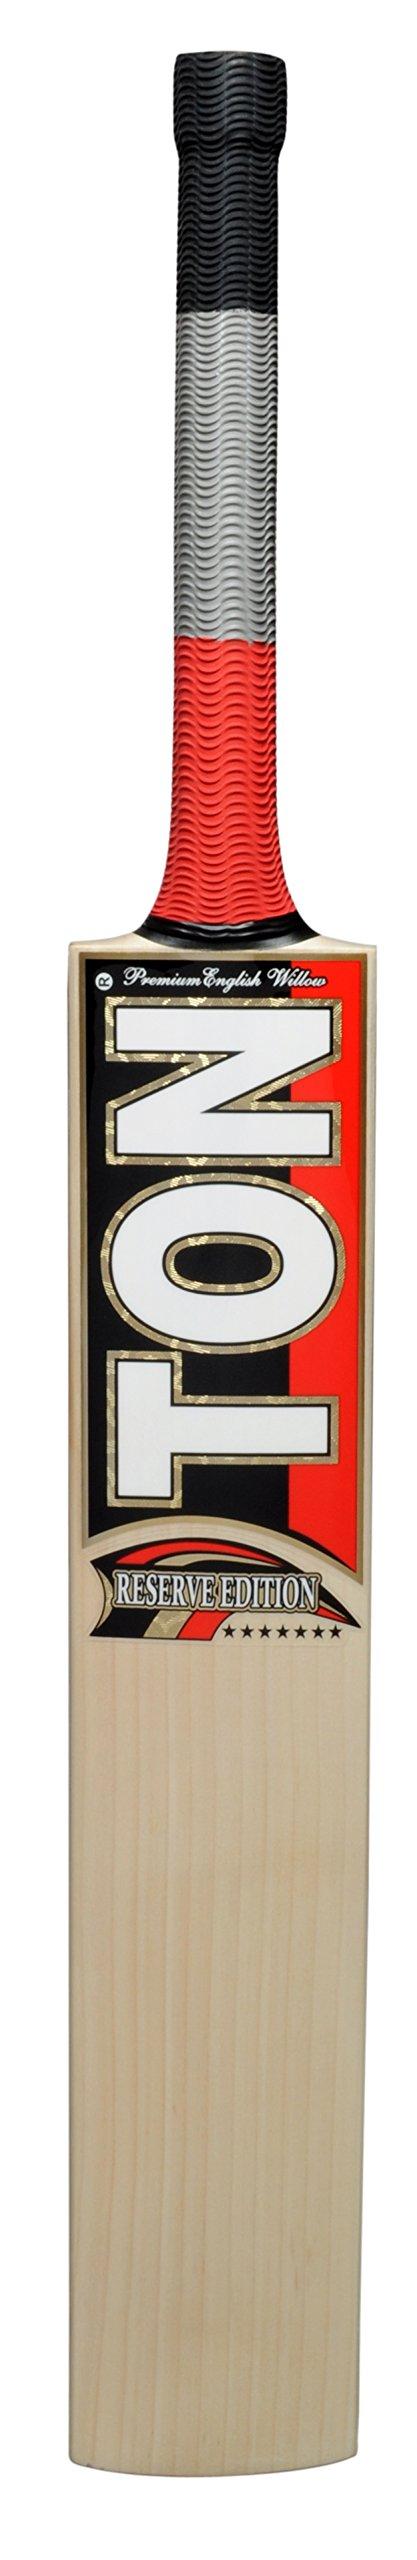 SS Men's Ton Reserve Edition Cricket SH Bat, Medium